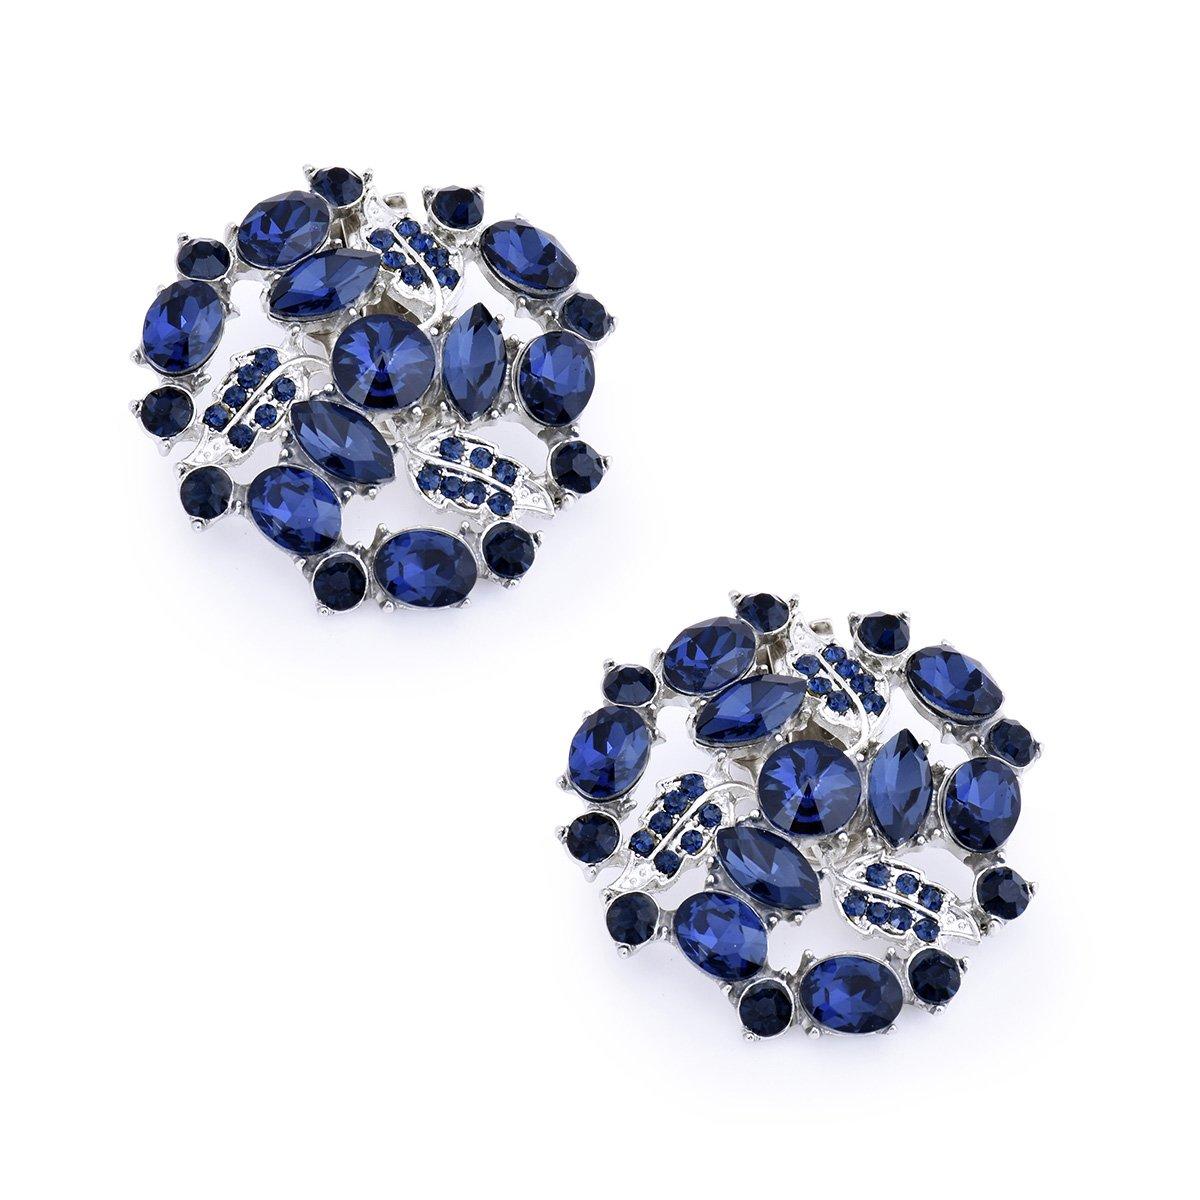 ElegantPark AM Women Rhinestones Decoration Wedding Party Shoe Clips 2 Pcs Navy Blue